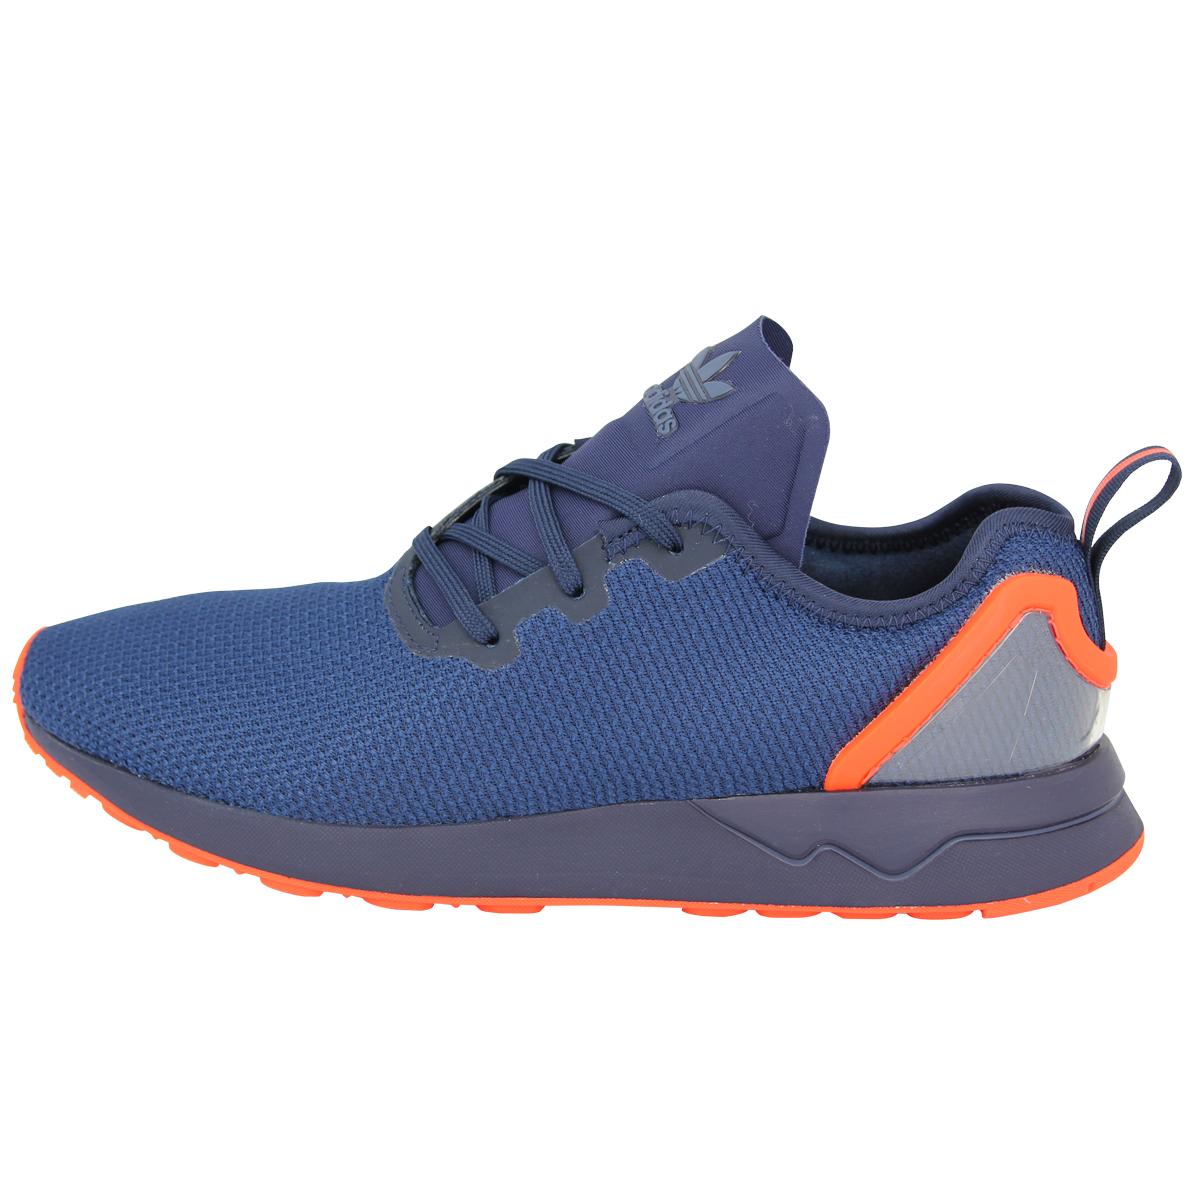 uk availability 5e50a 135d7 adidas Originals ZX FLUX ADV ASYMETRICAL Chaussures Mode Sneakers Homme Bleu  Ora 2 2 sur 6 ...